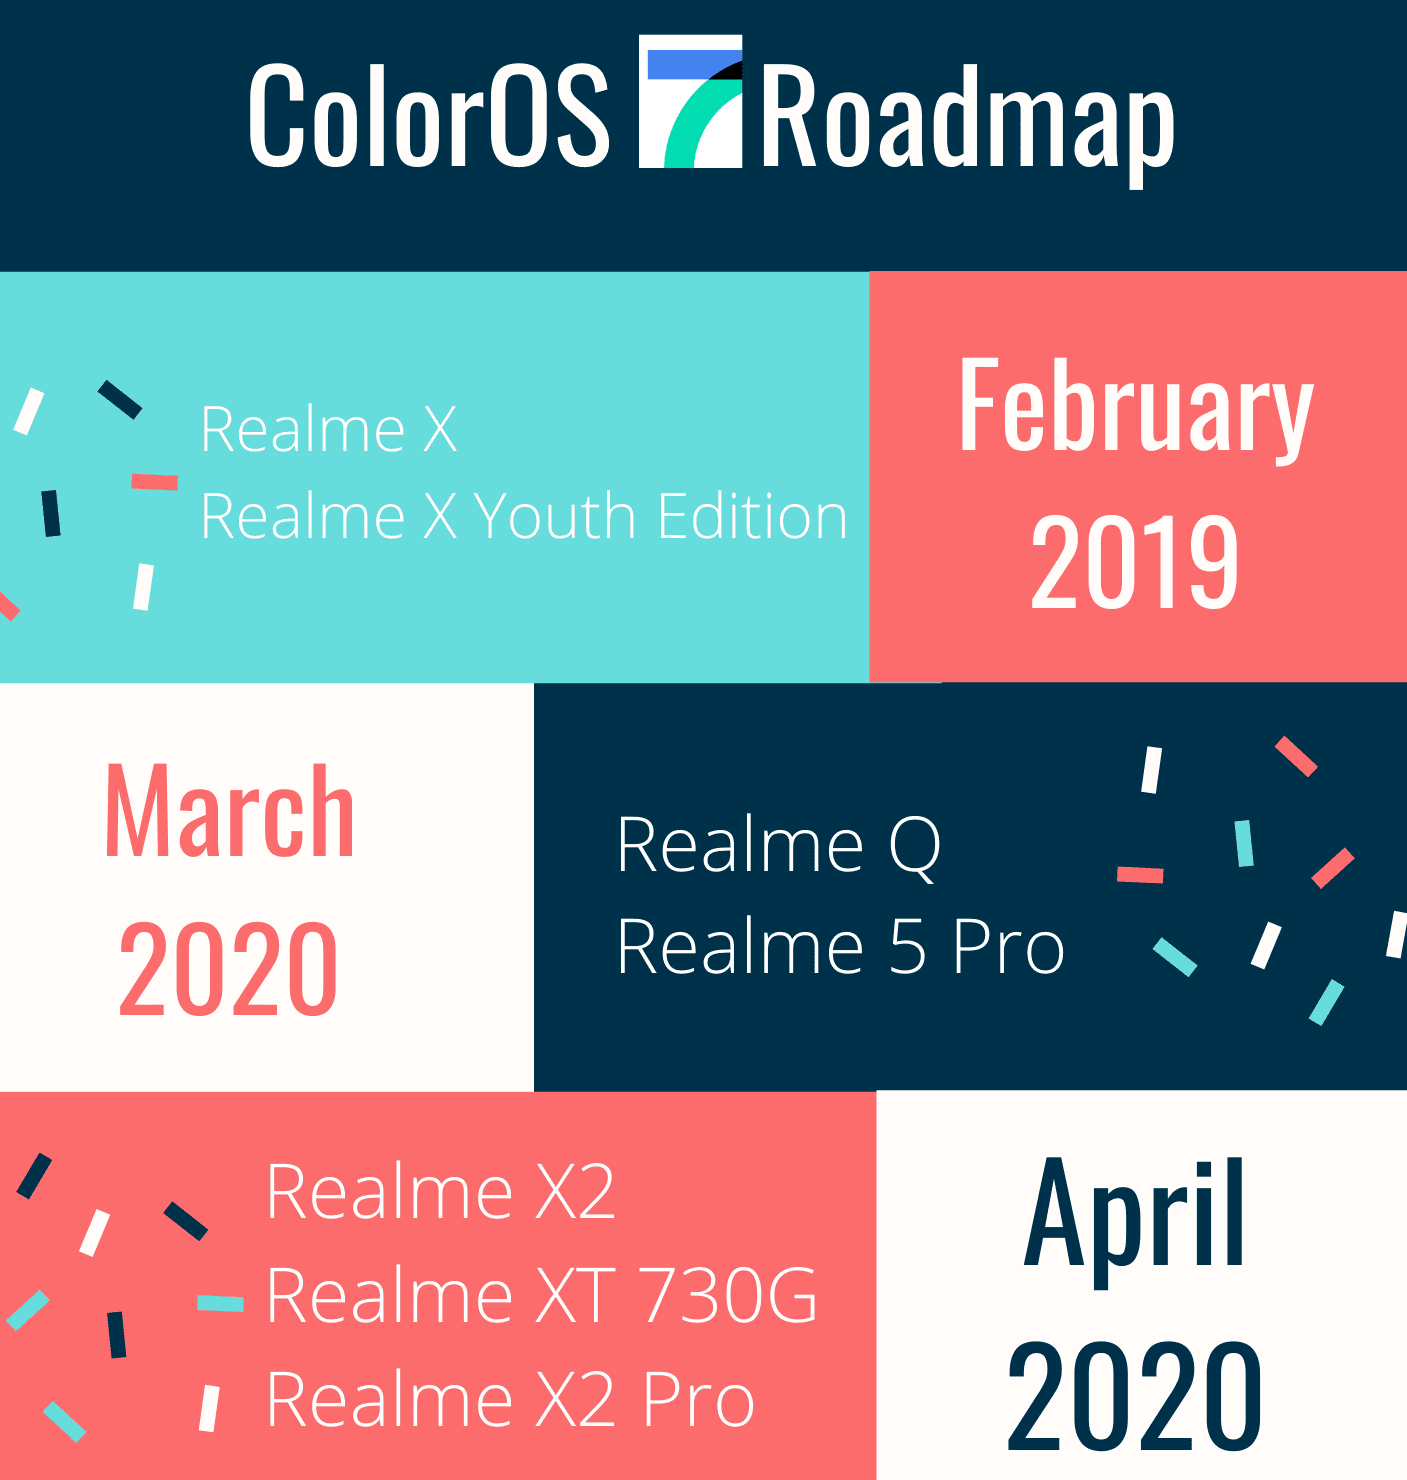 ColorOS 7 for Realme